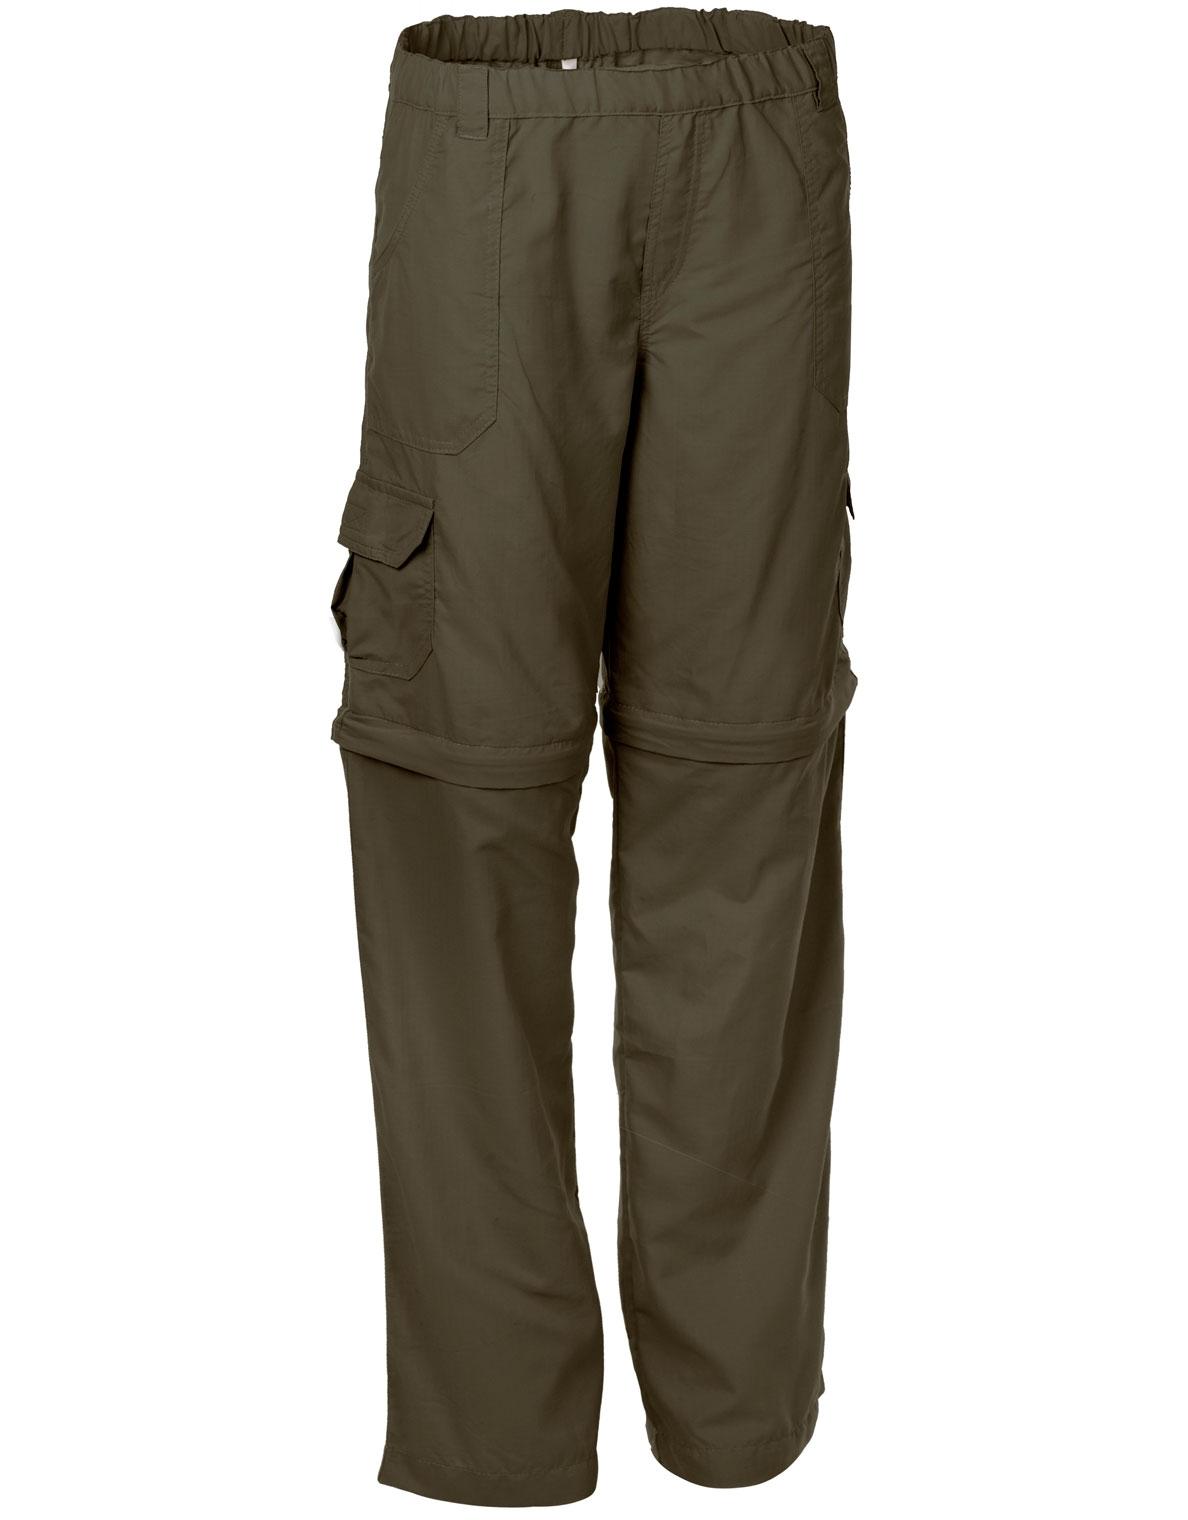 Boys Girls Rufiji Maratech Zip Off Safari Trousers